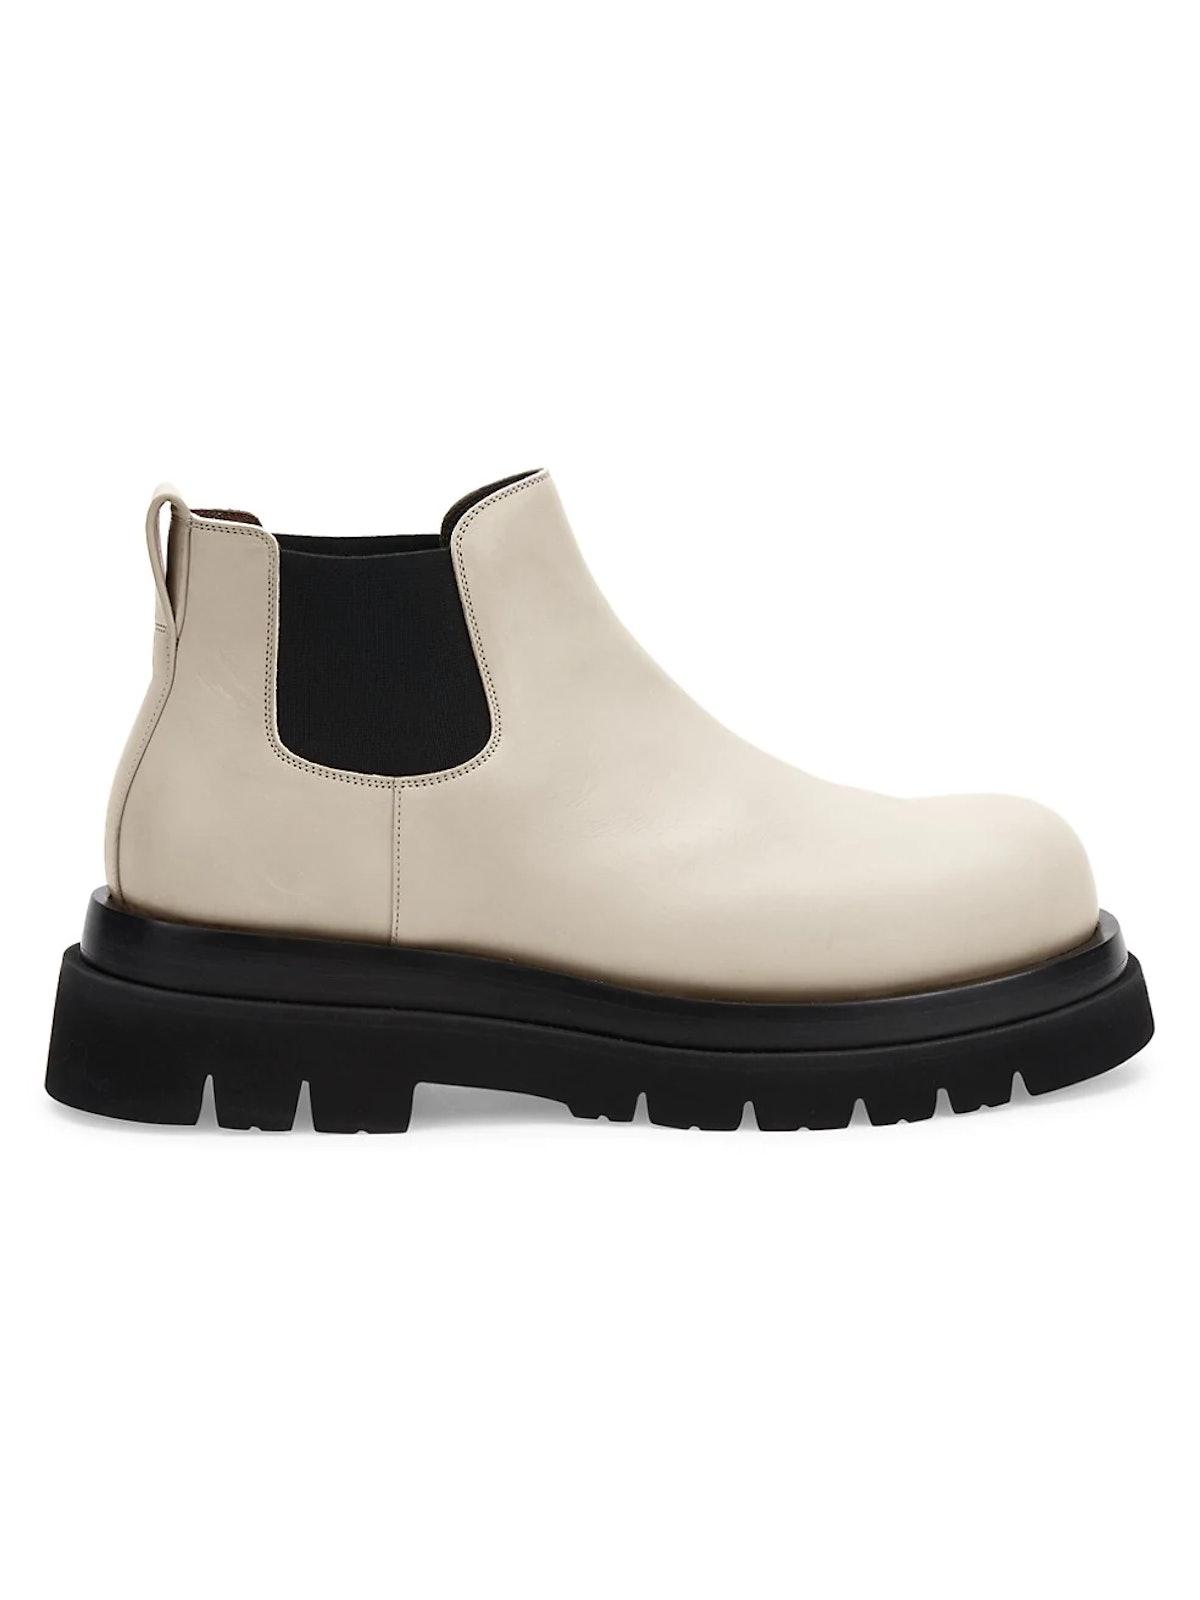 White Lug Leather Chelsea Boots from Bottega Veneta, available to shop on Saks Fifth Avenue.